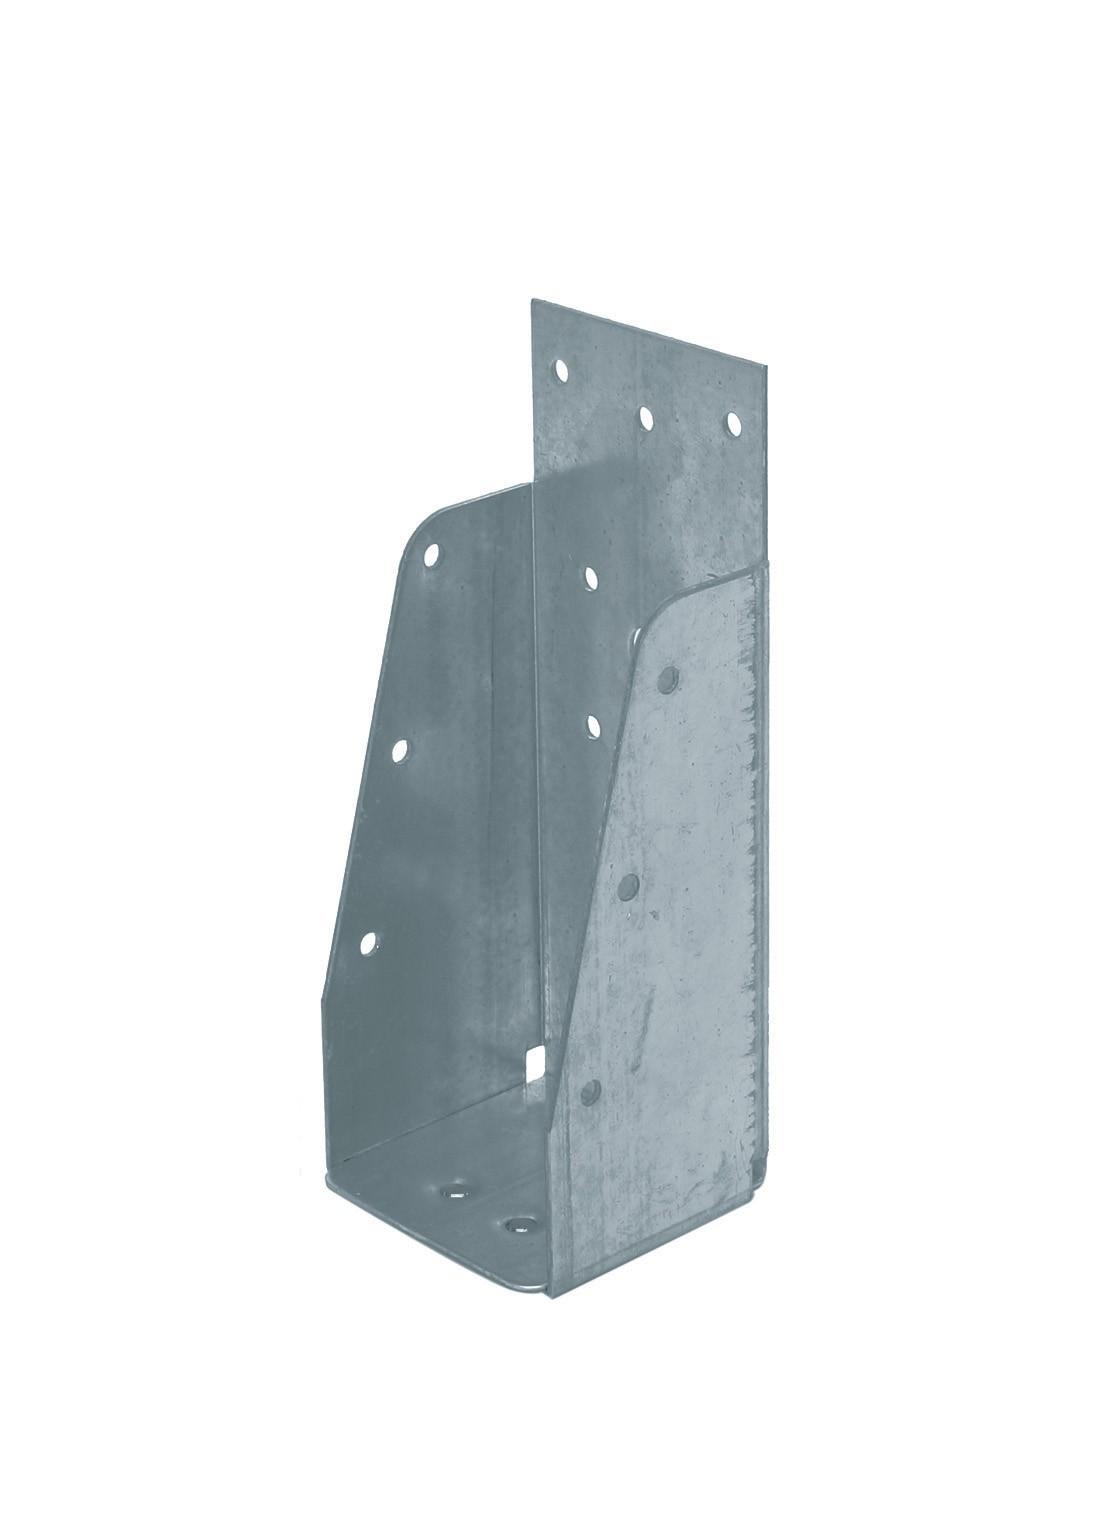 Joist hanger GBS-ZL 50x125 1,5 SV